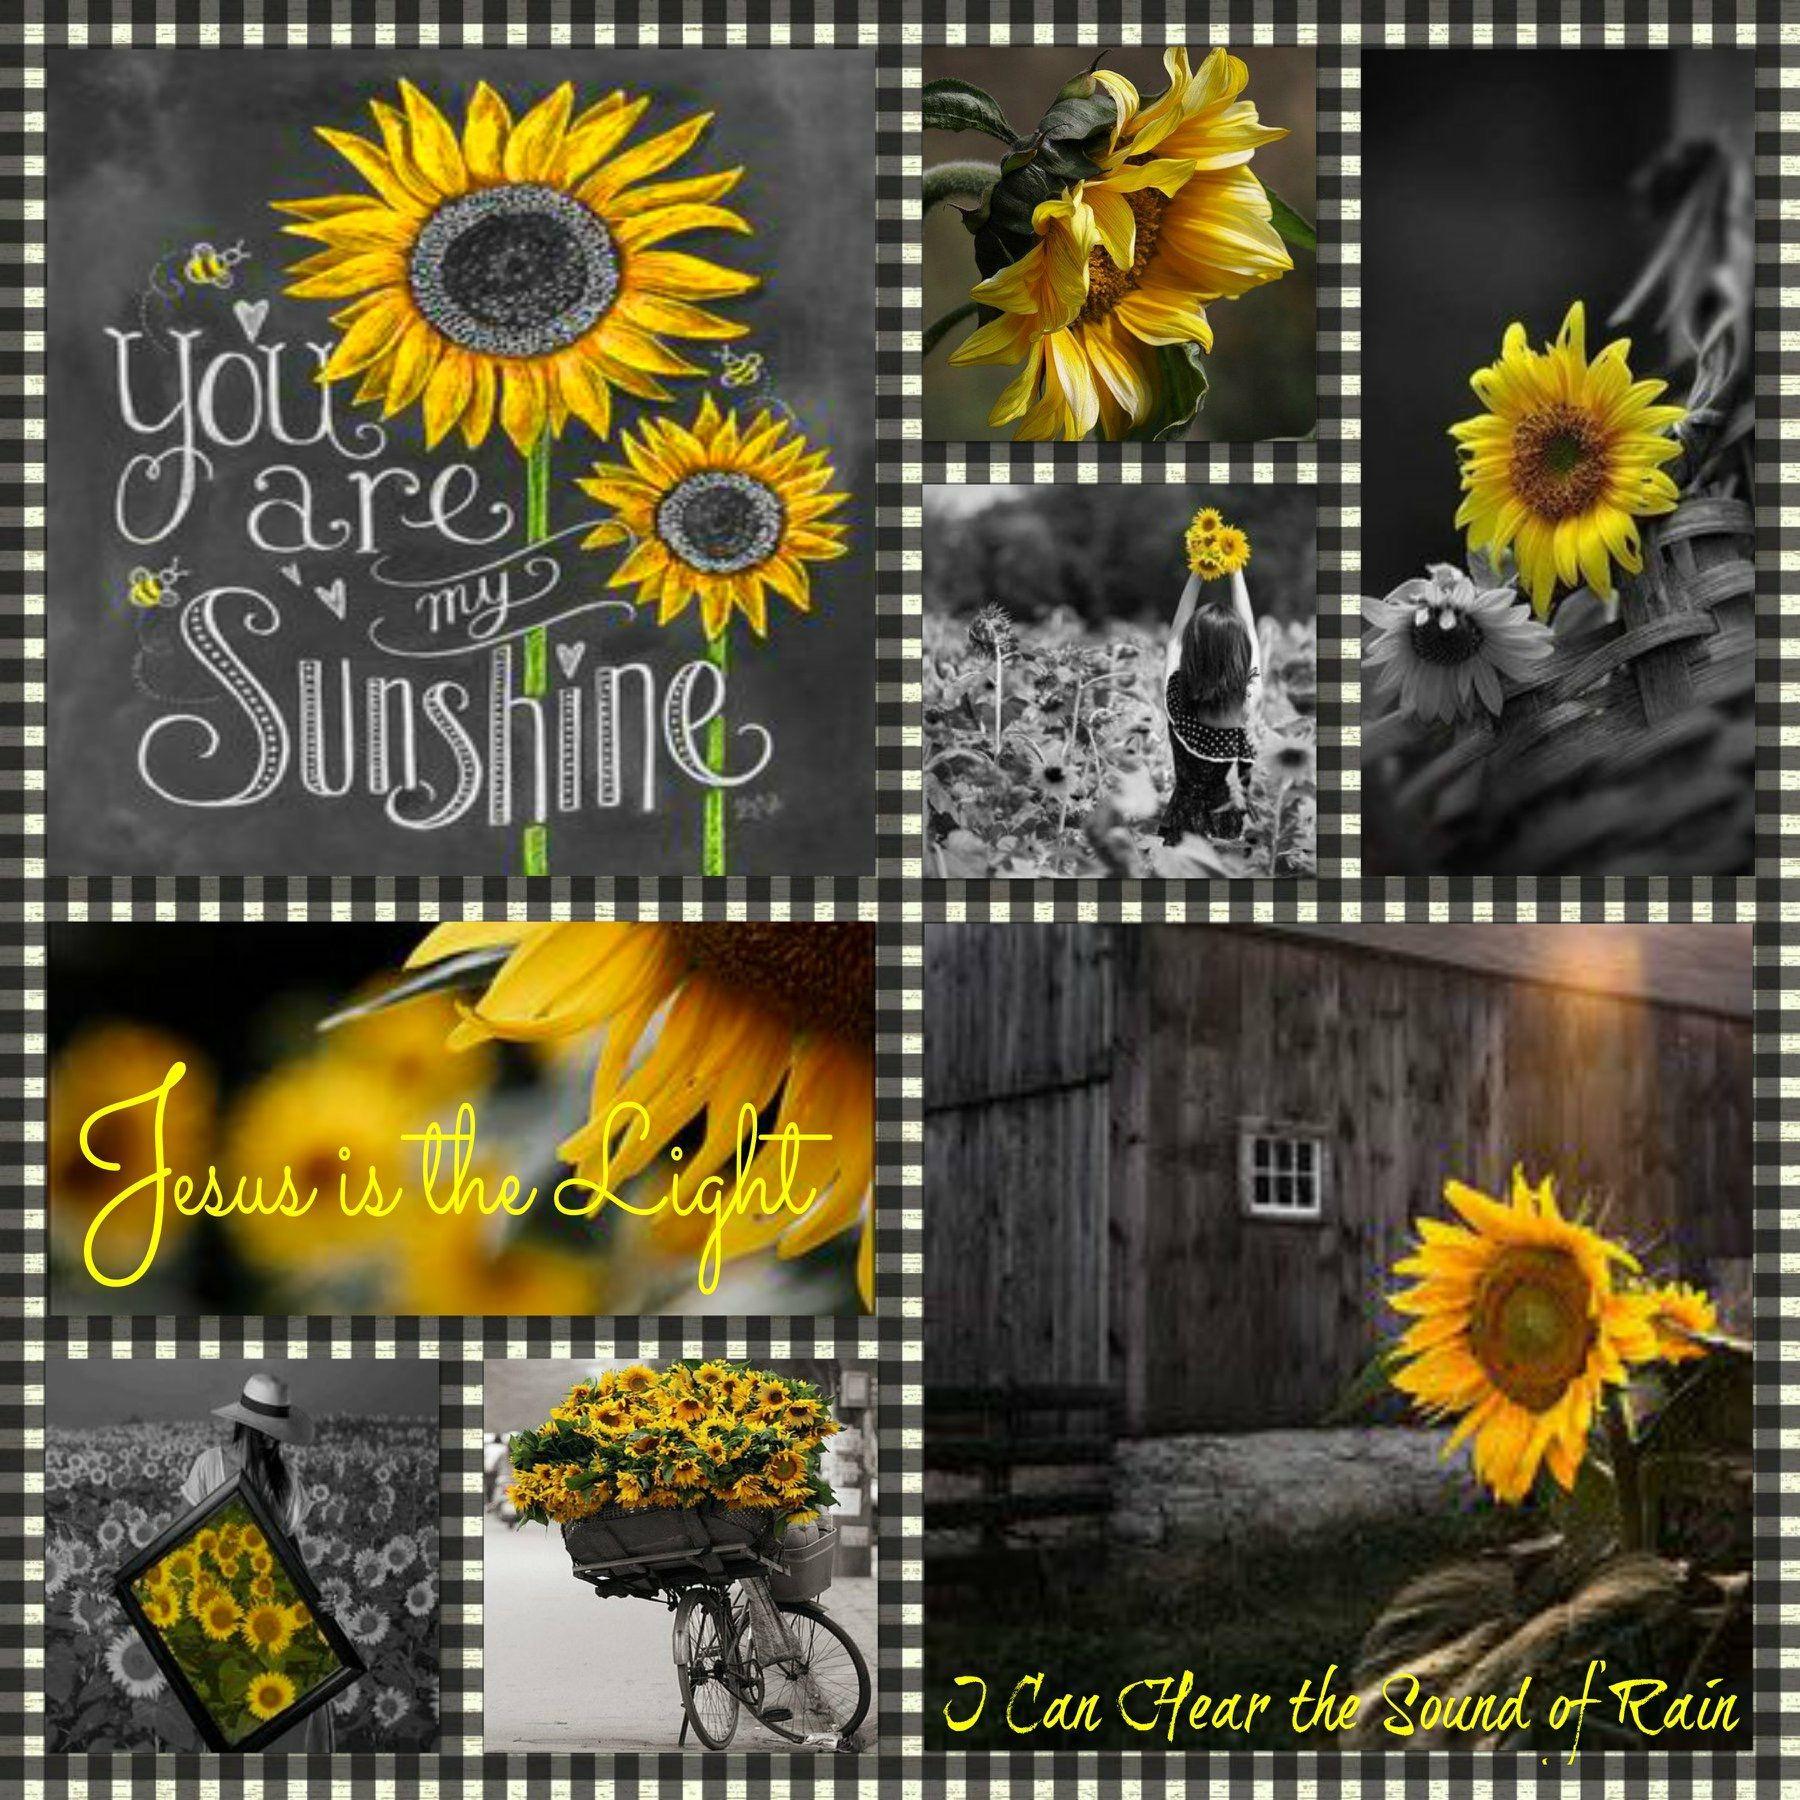 Pin von Mary Lou auf Good mood mornings | Pinterest | Sonnenblumen ...